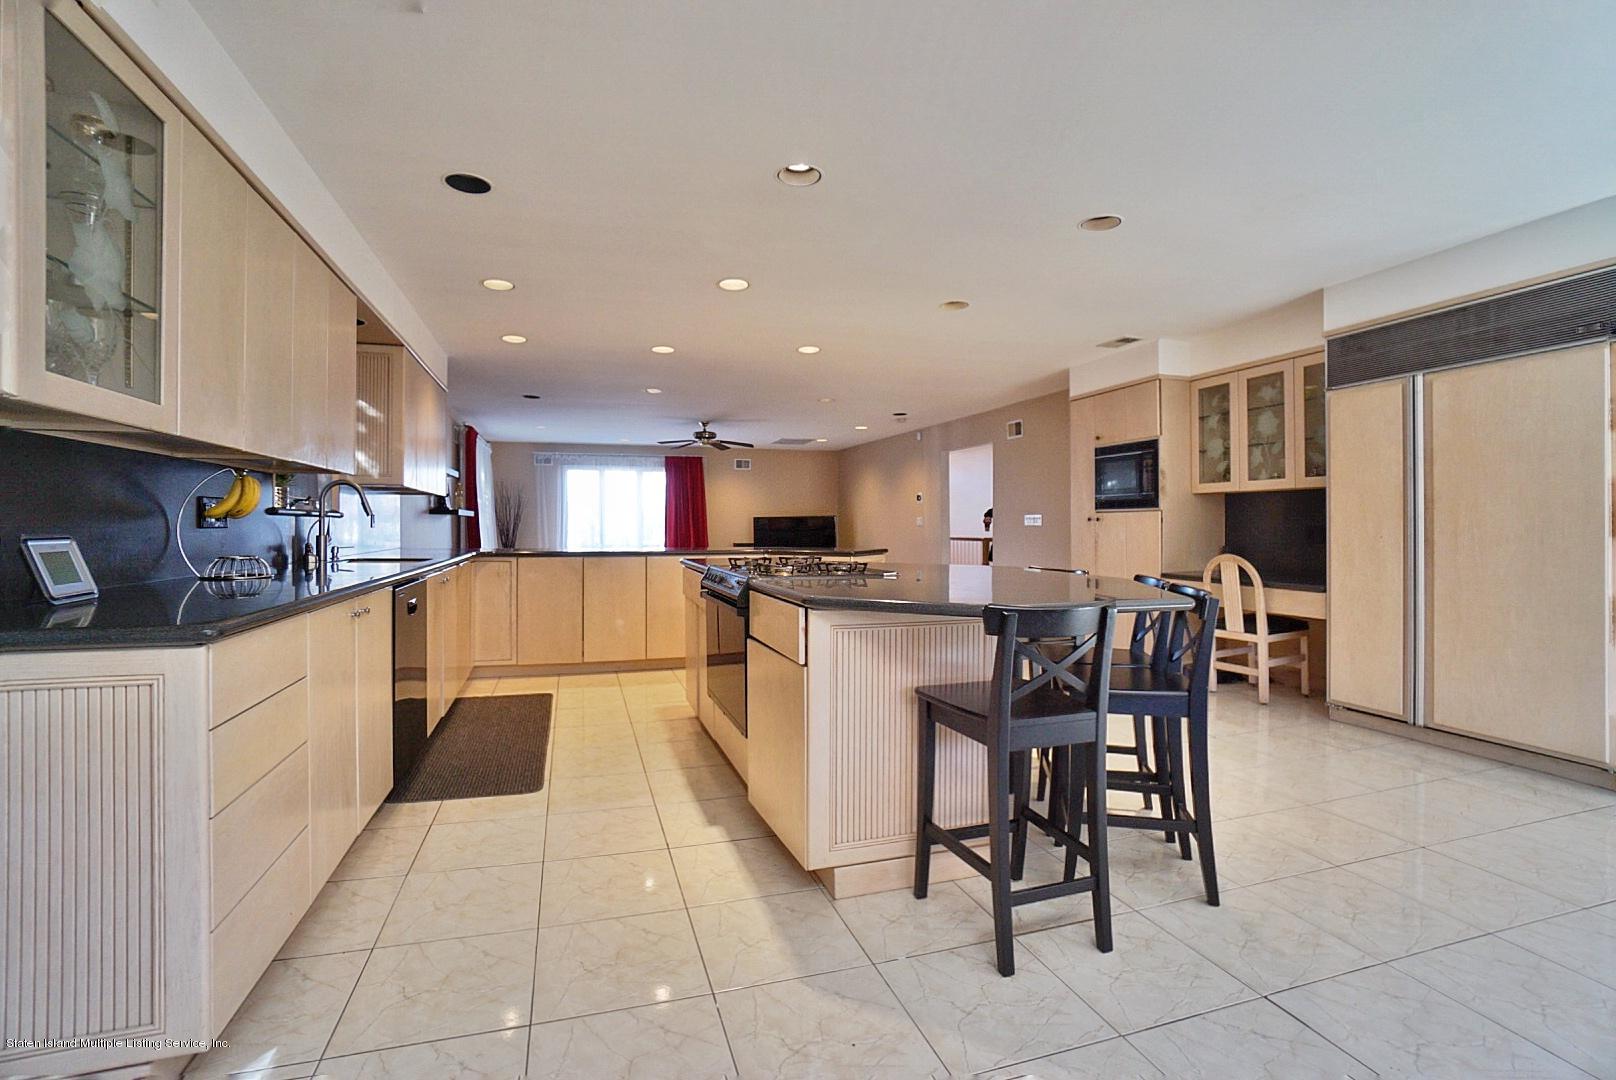 Single Family - Detached 183 Kensington Avenue  Staten Island, NY 10305, MLS-1127107-10